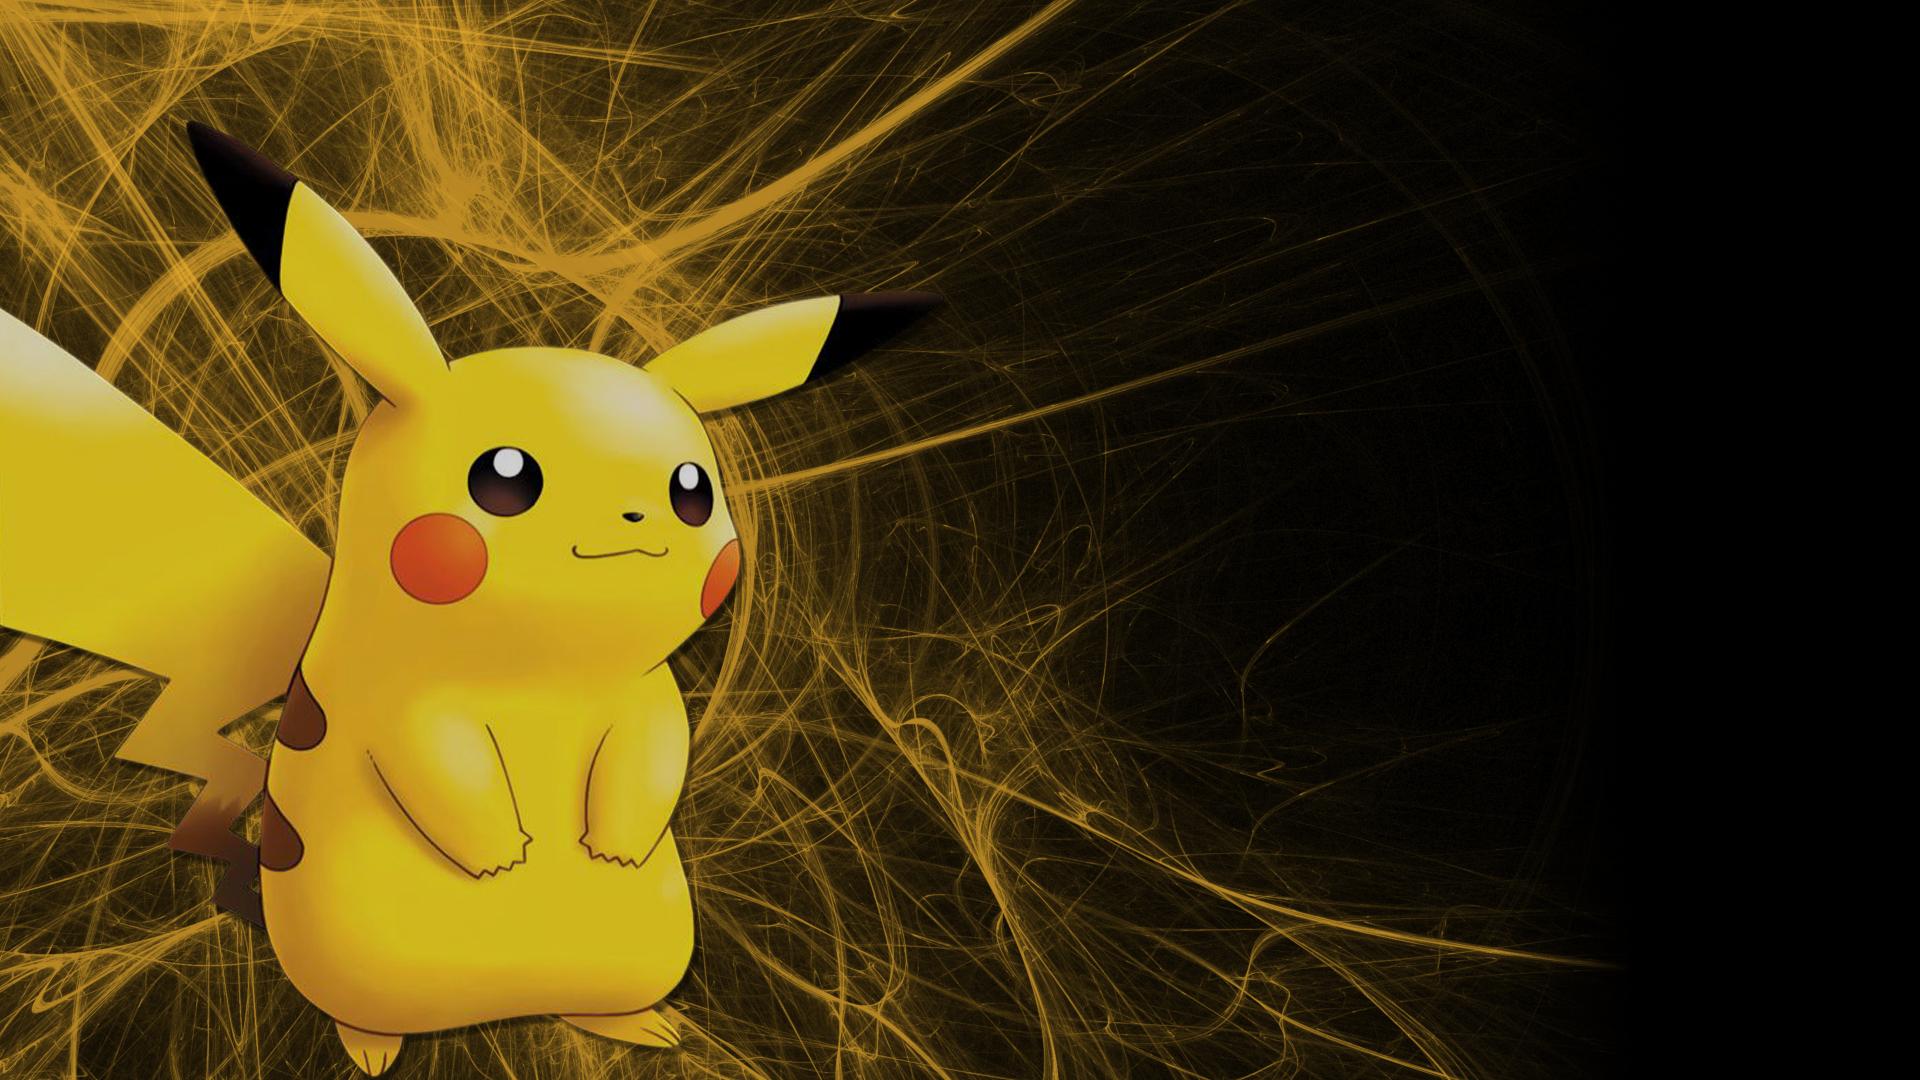 Pikachu wallpaper by SneezePin on DeviantArt